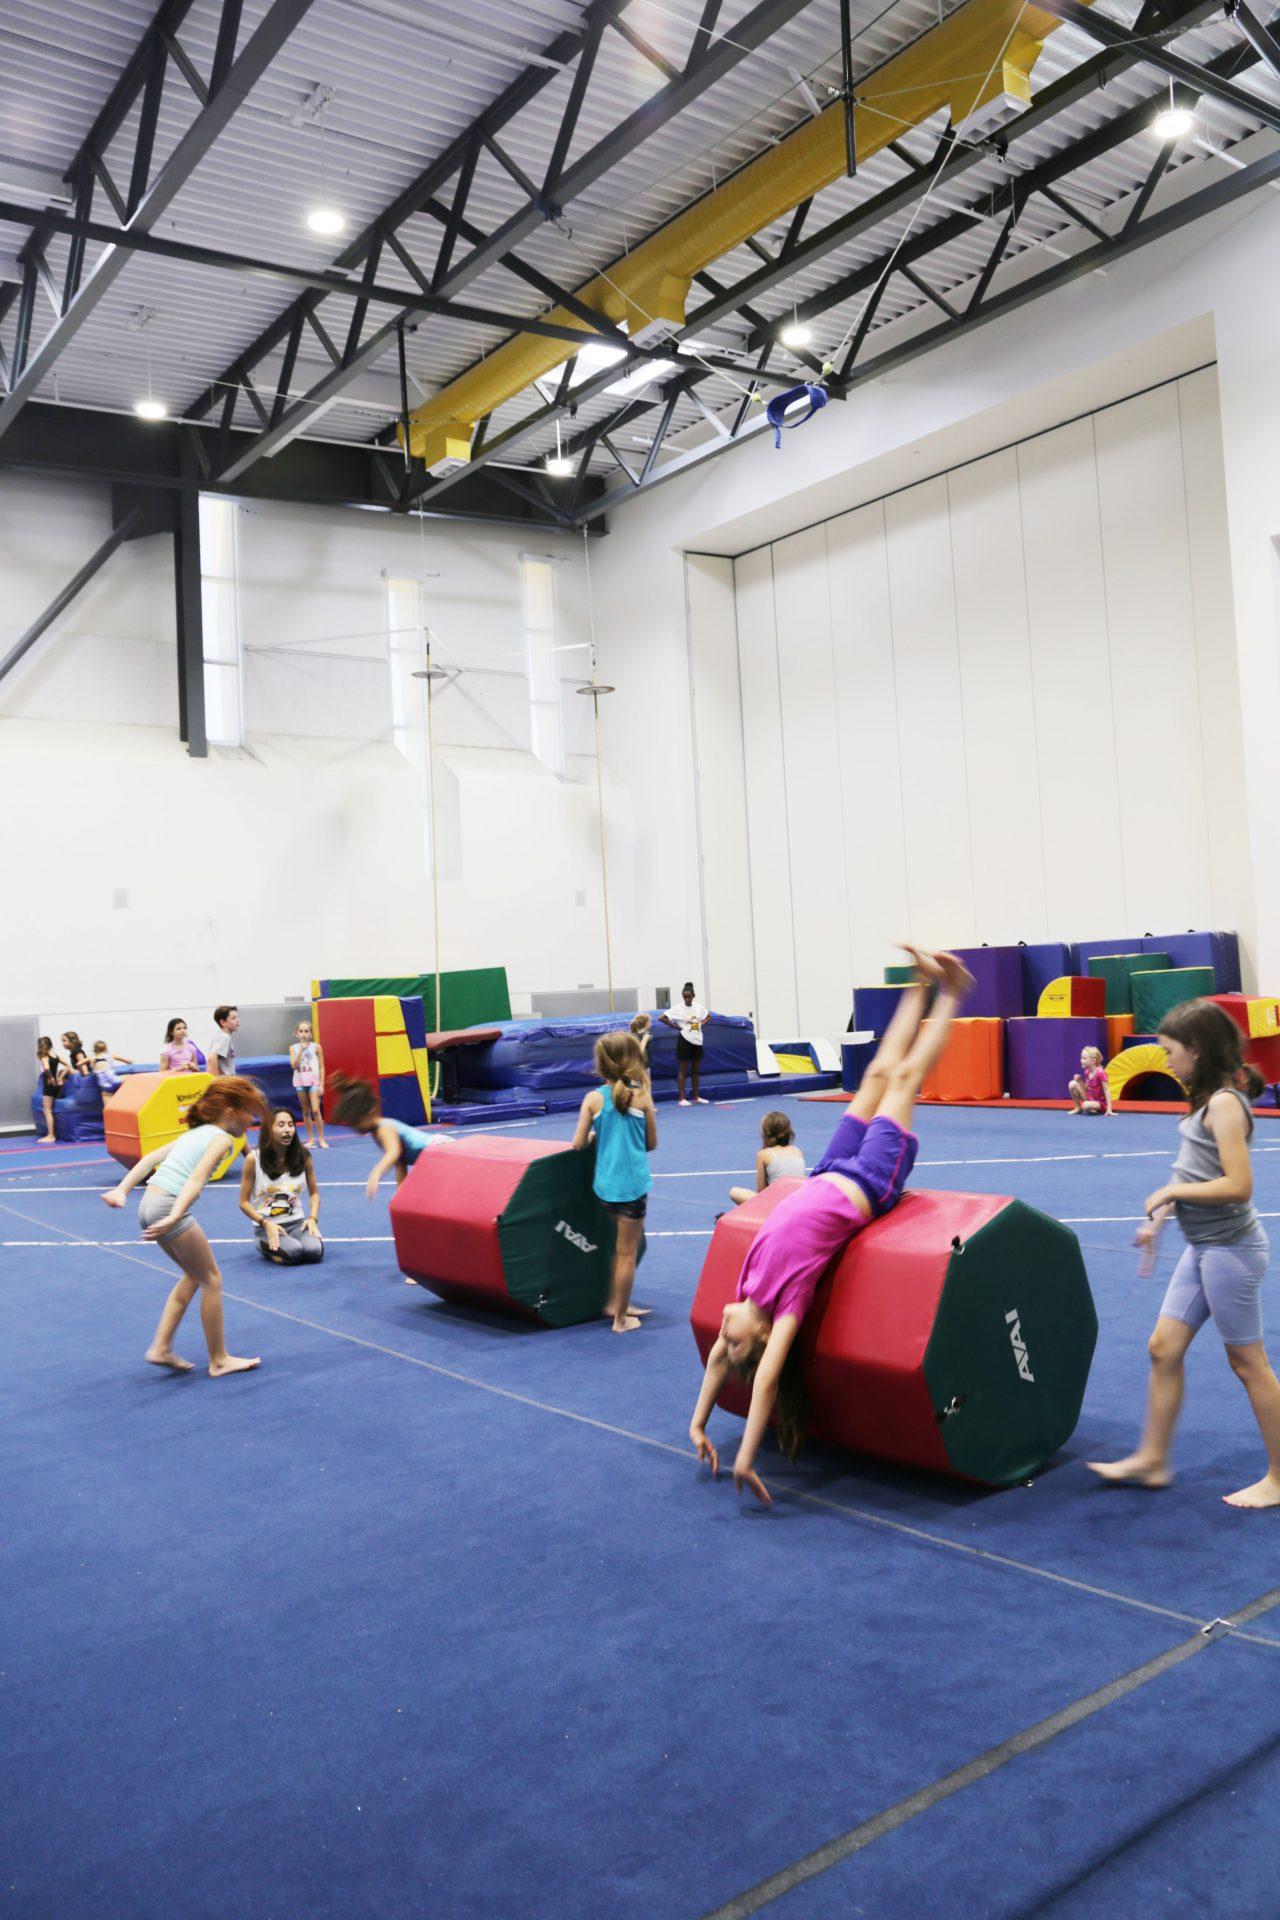 monarch-camps-summer-camp-gymnastics-camp-children-tumbling-on-gymnastic-floor-1-1280x1920.jpg